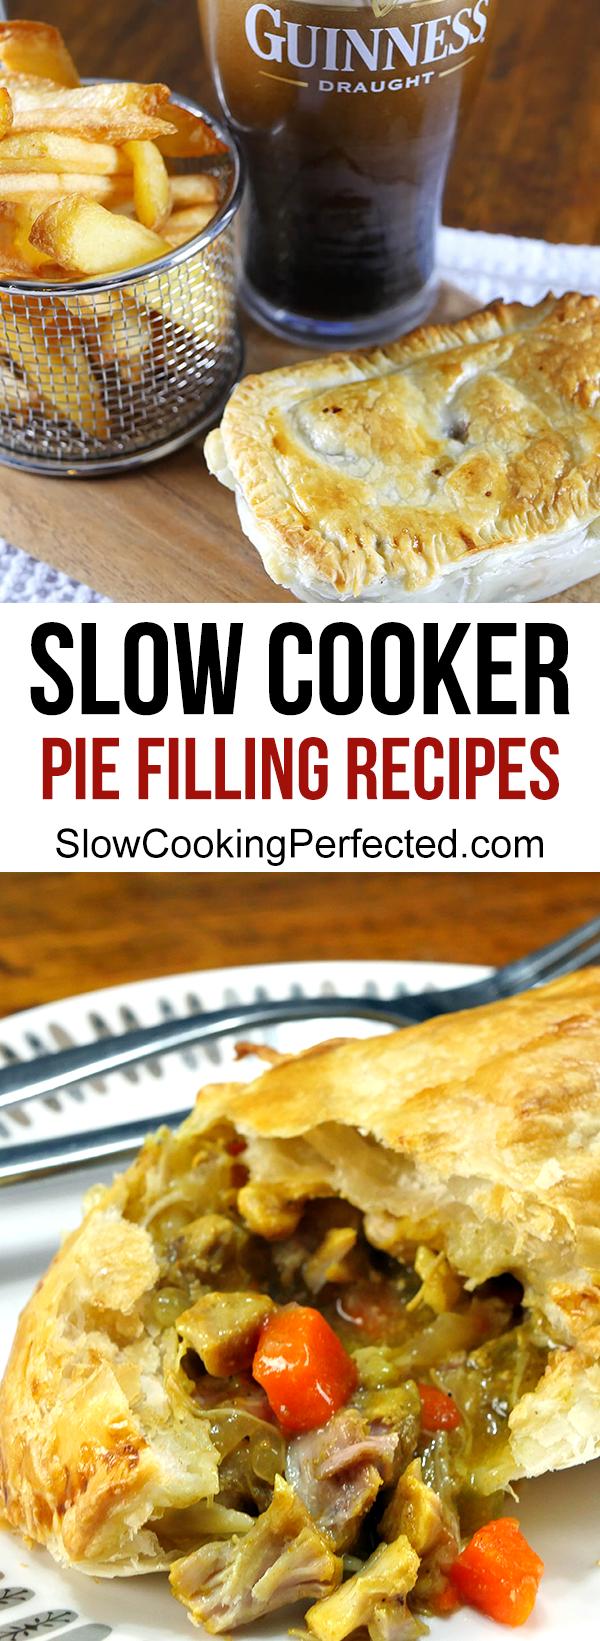 Slow Cooker Steak Pie | Recipe | Food recipes, Food, Pie ...